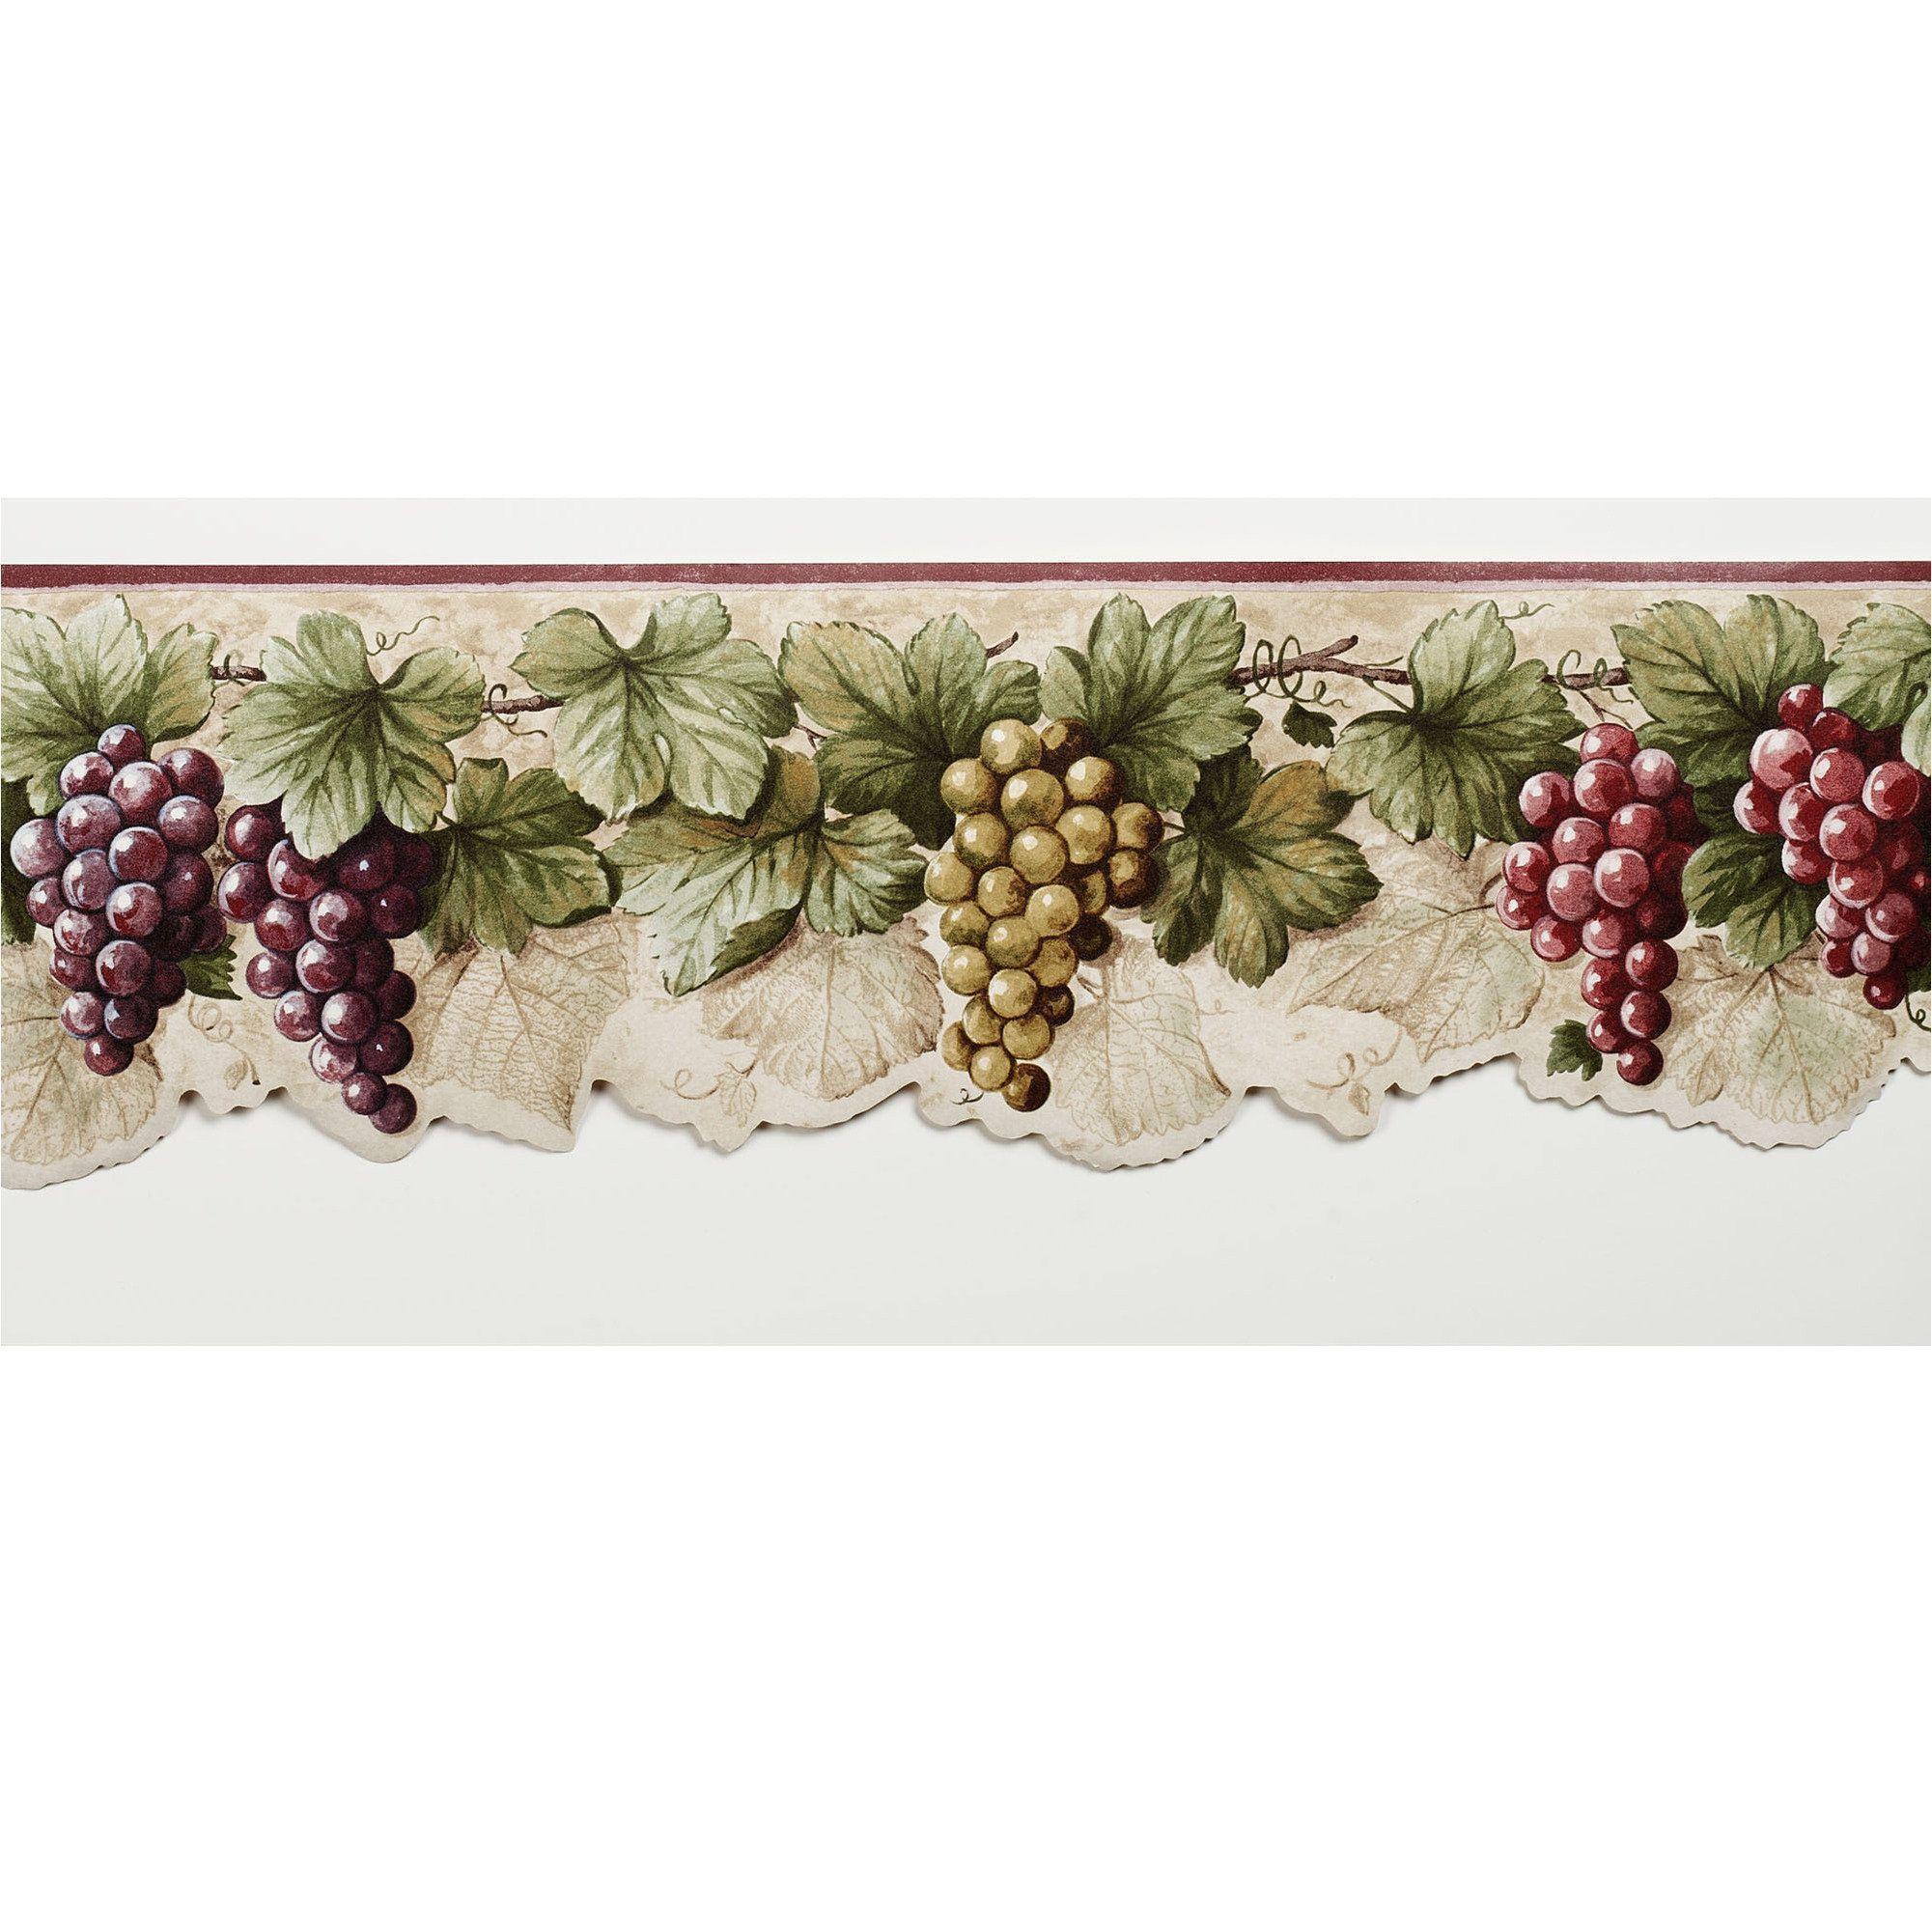 Free Fall Harvest Desktop Wallpaper Grapes Wallpapers Wallpaper Cave